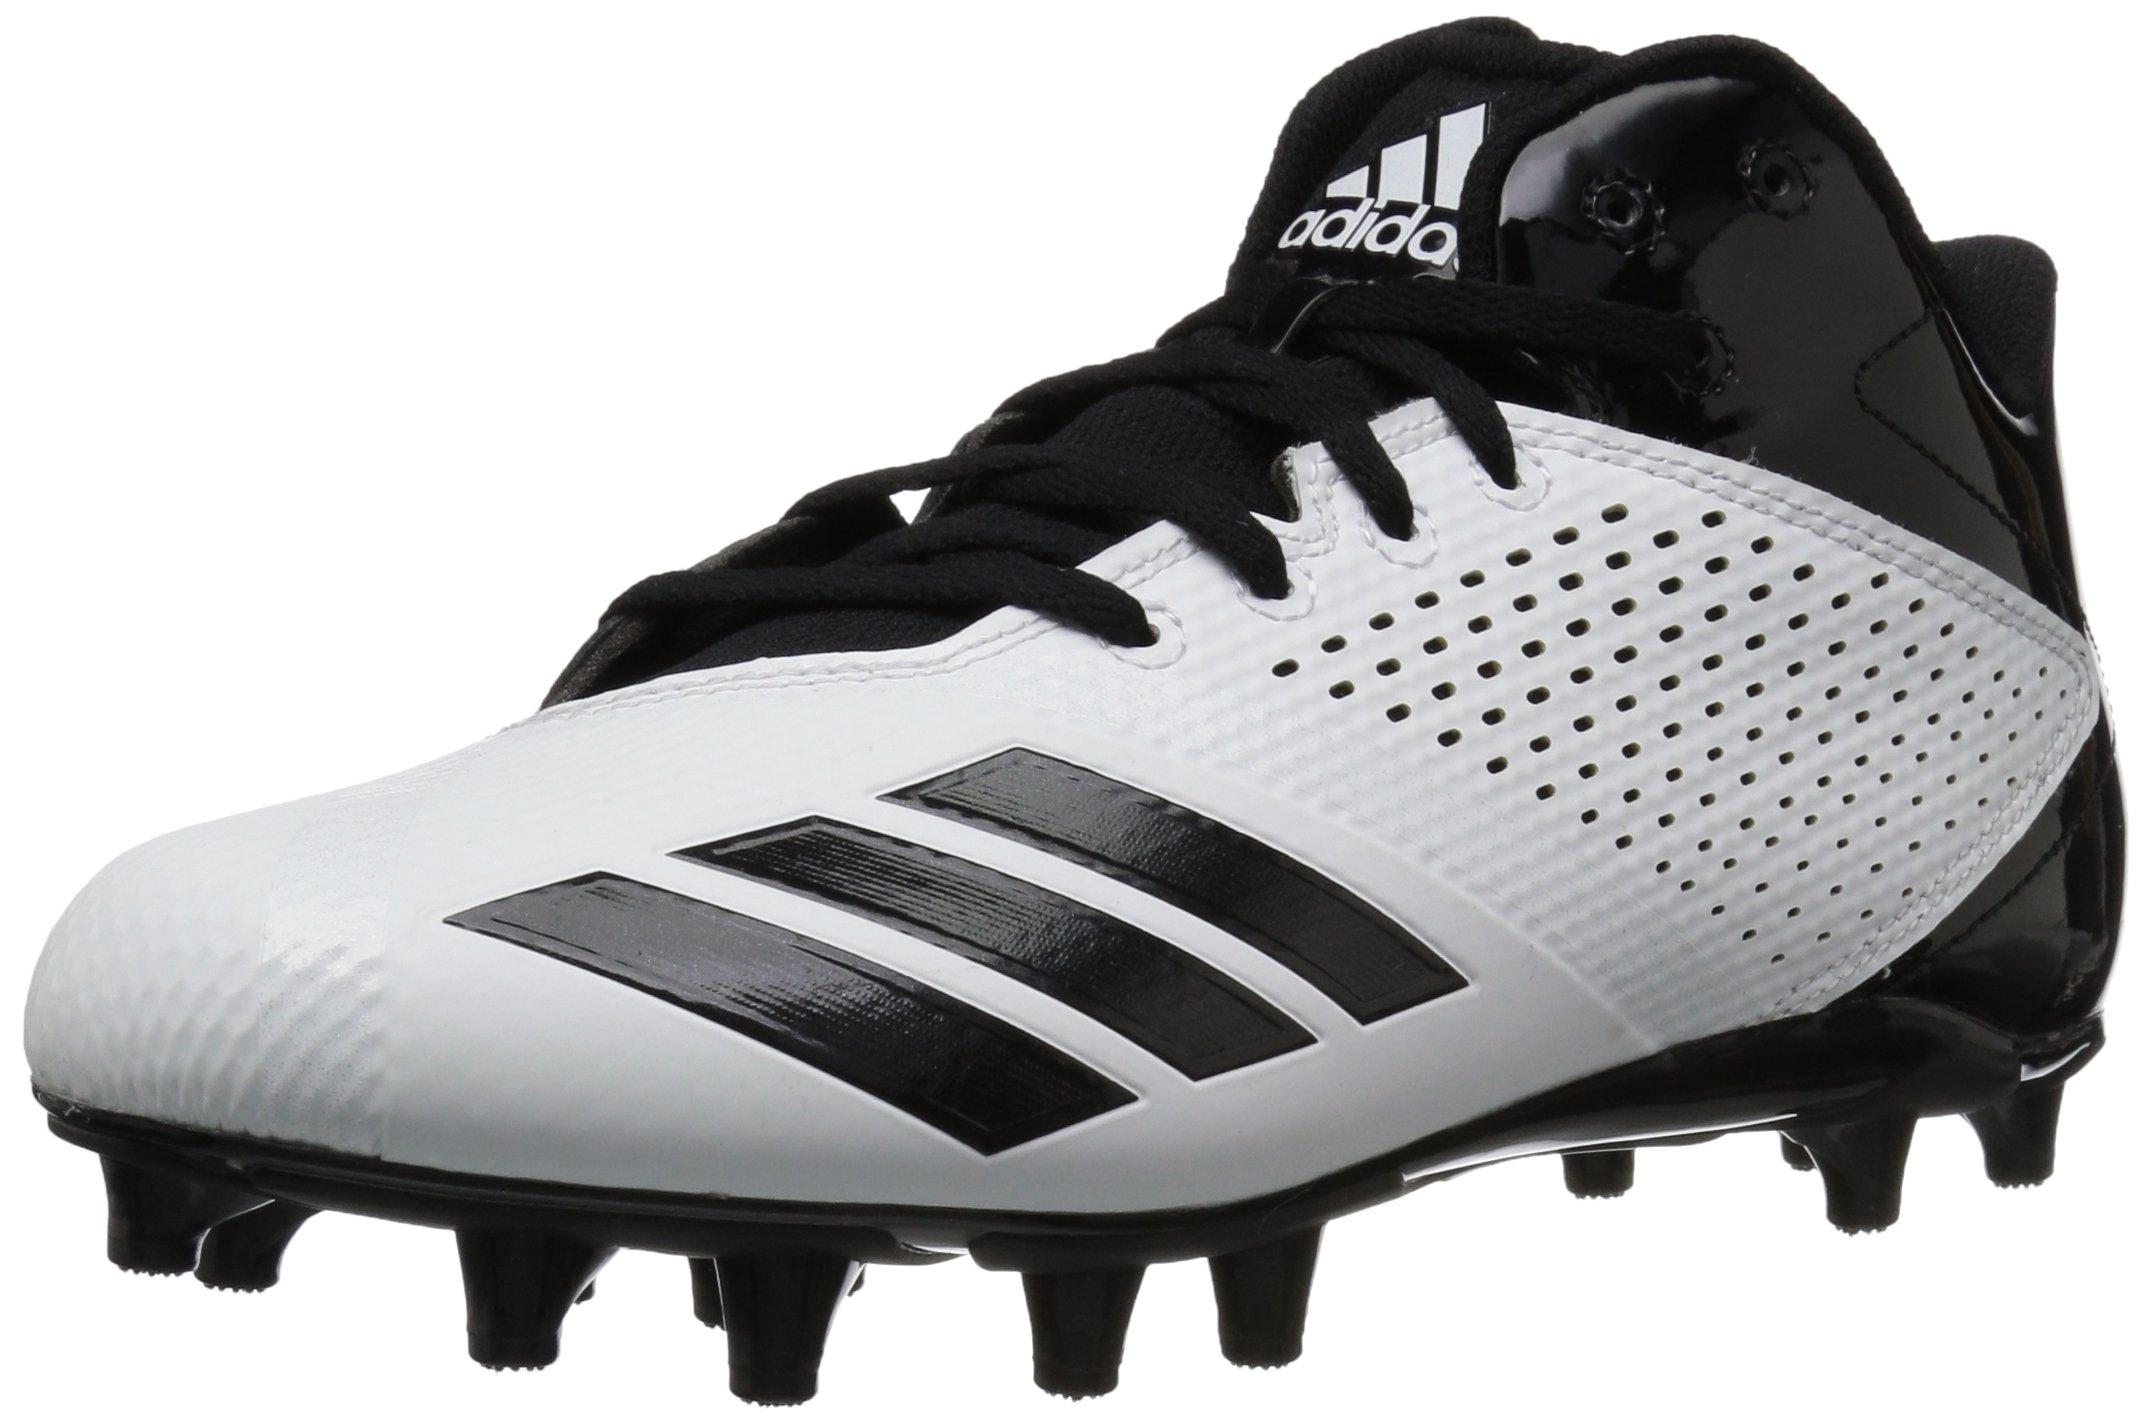 adidas Men's 5.5 Star Mid Football Shoe, White/Black/Black, 9.5 M US